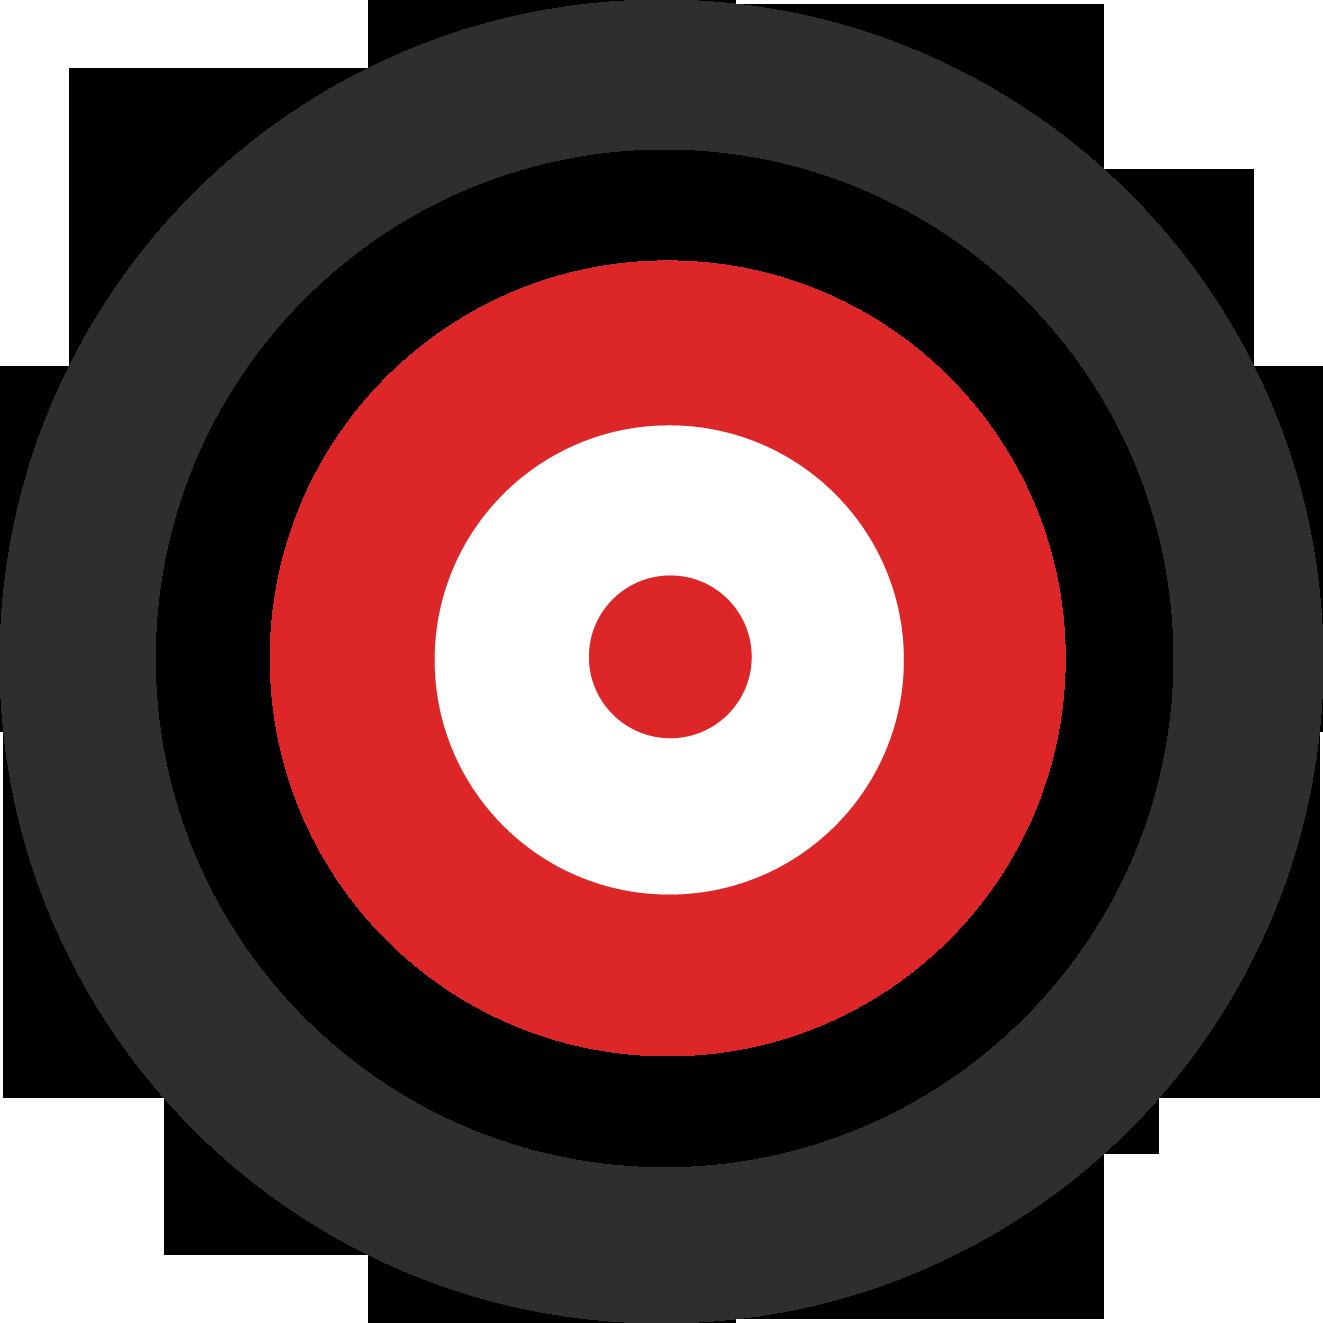 Target Symbol Png Transparent Background Free Download 4534 Freeiconspng